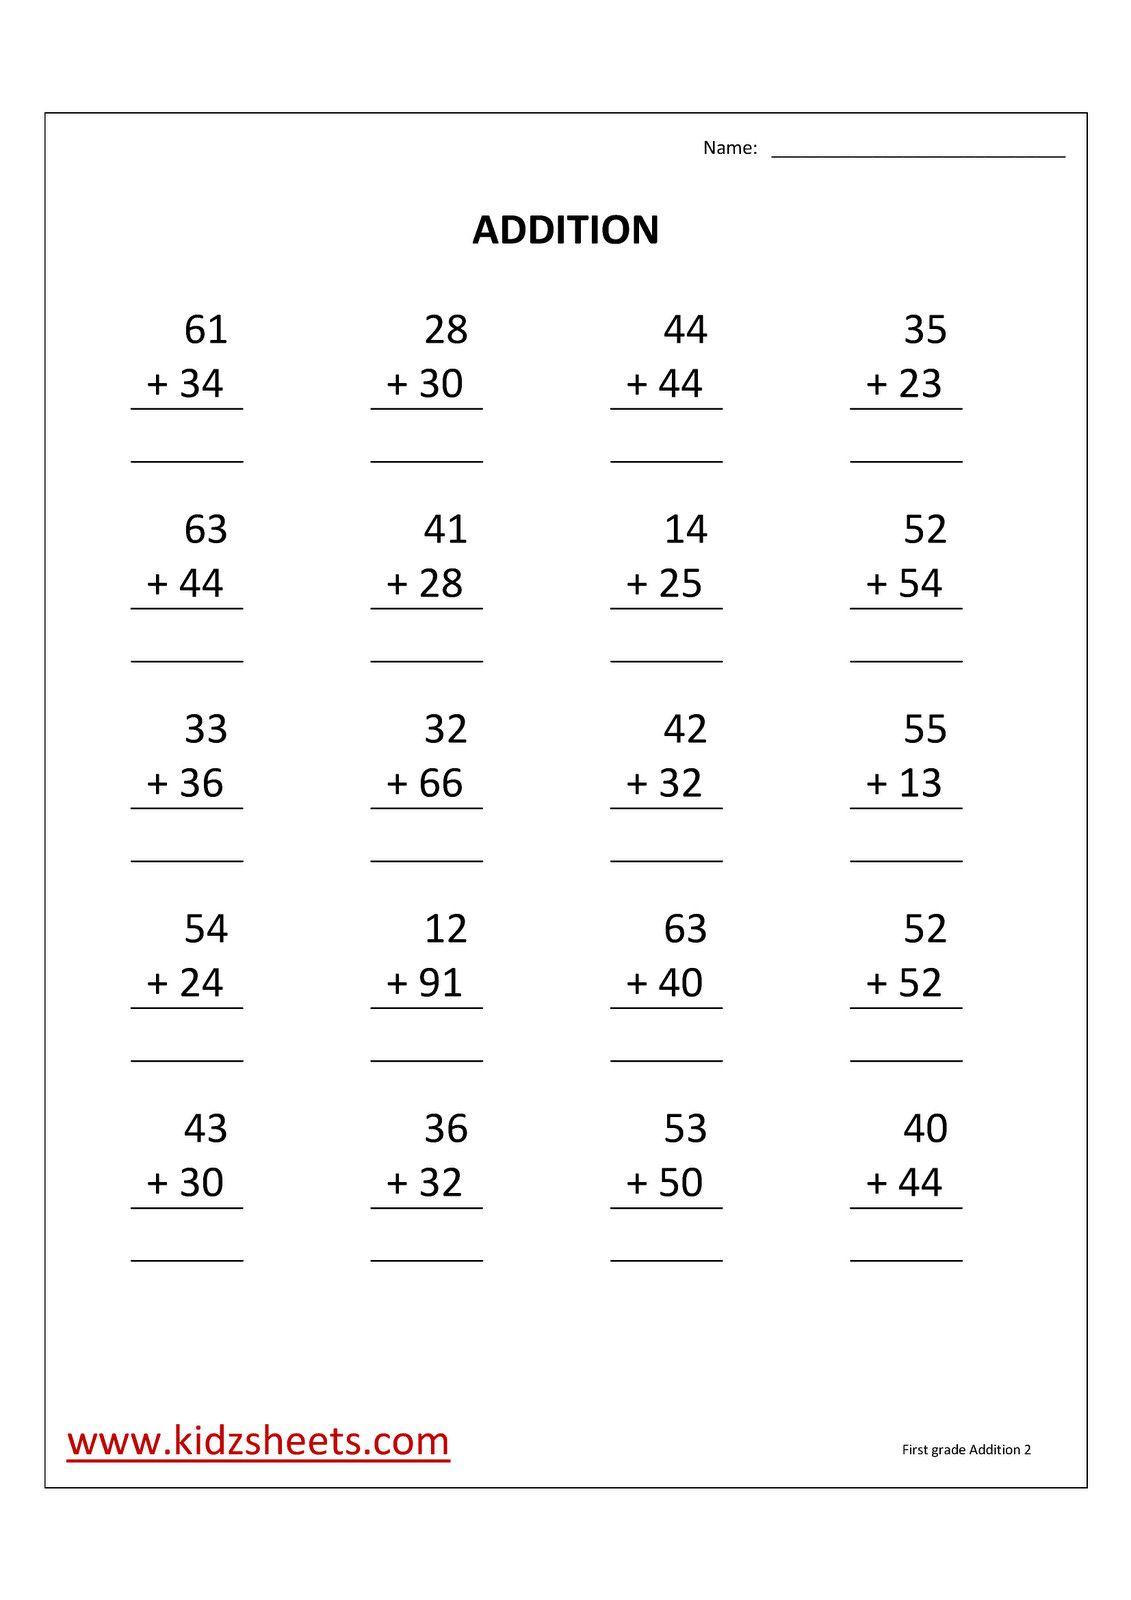 2 Addition Sentences Worksheets First Grade Math Addition Worksheets In 2020 Math Addition Worksheets 2nd Grade Math Worksheets 1st Grade Math Worksheets [ 1600 x 1131 Pixel ]